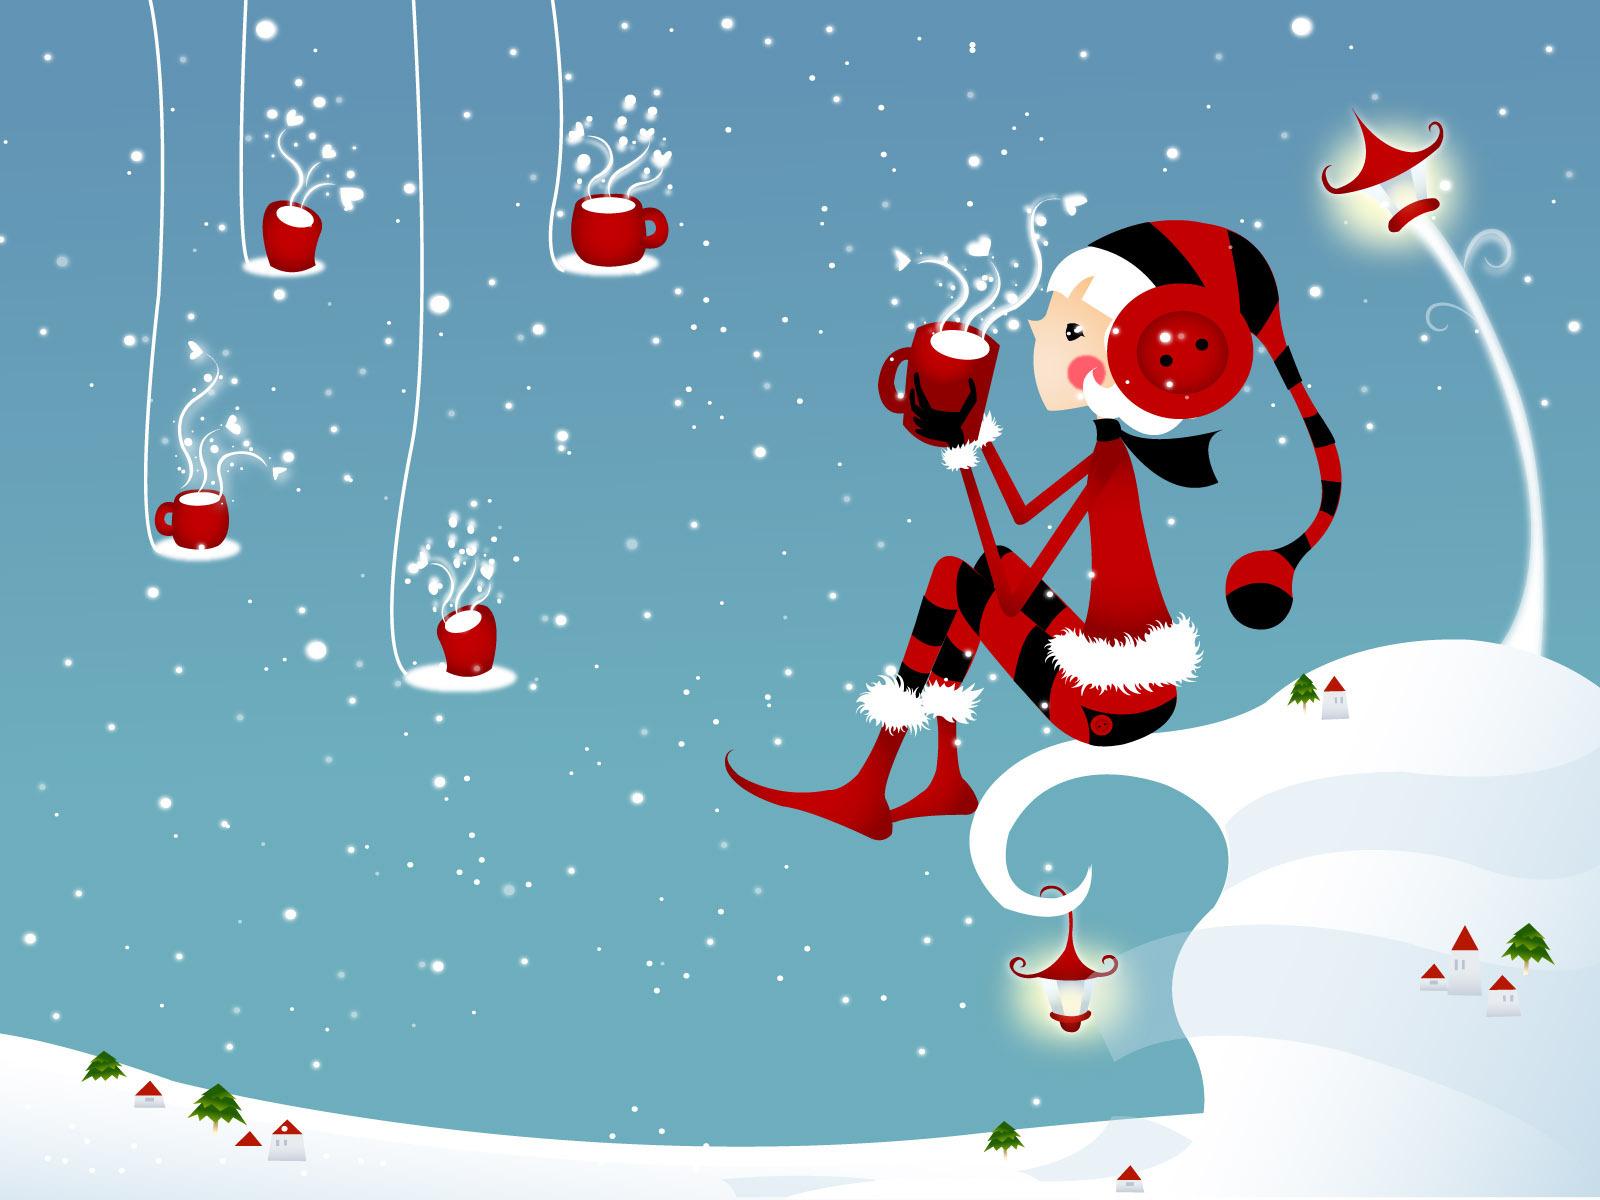 Christmas desktop wallpapers hd desktop wallpaper collections